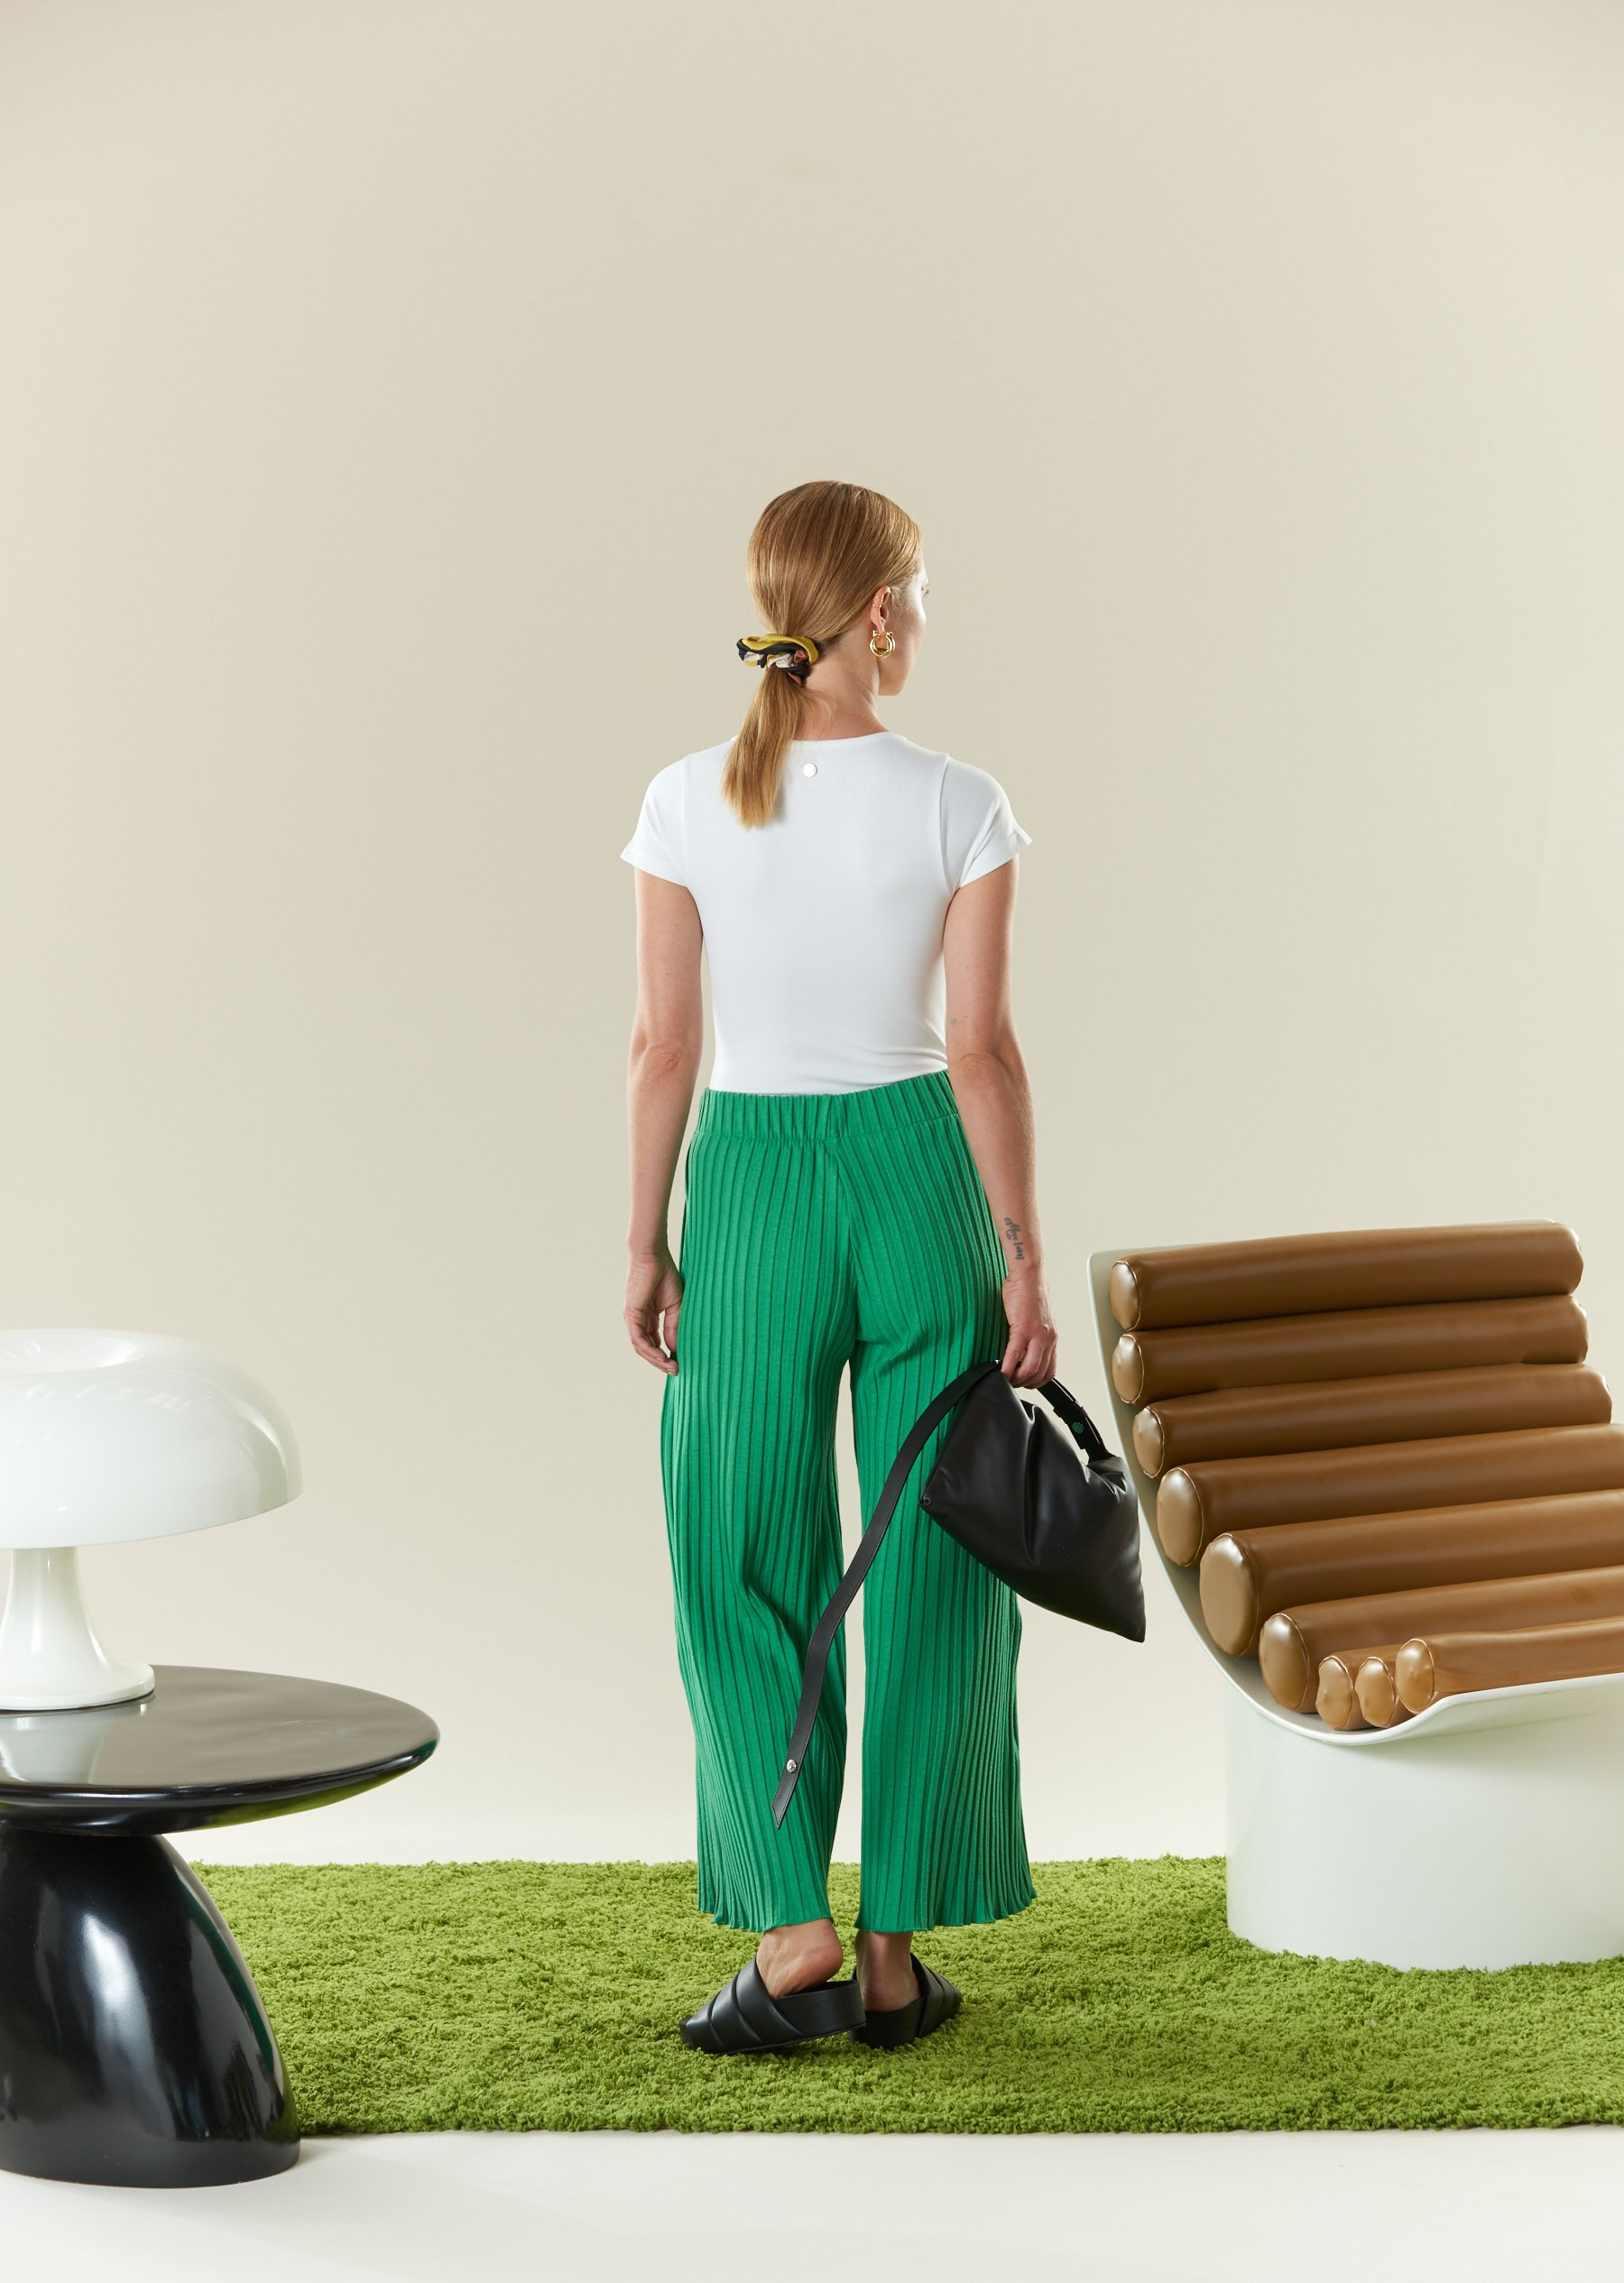 STRETCH Marce Bodysuit in White by Simon Miller - 3